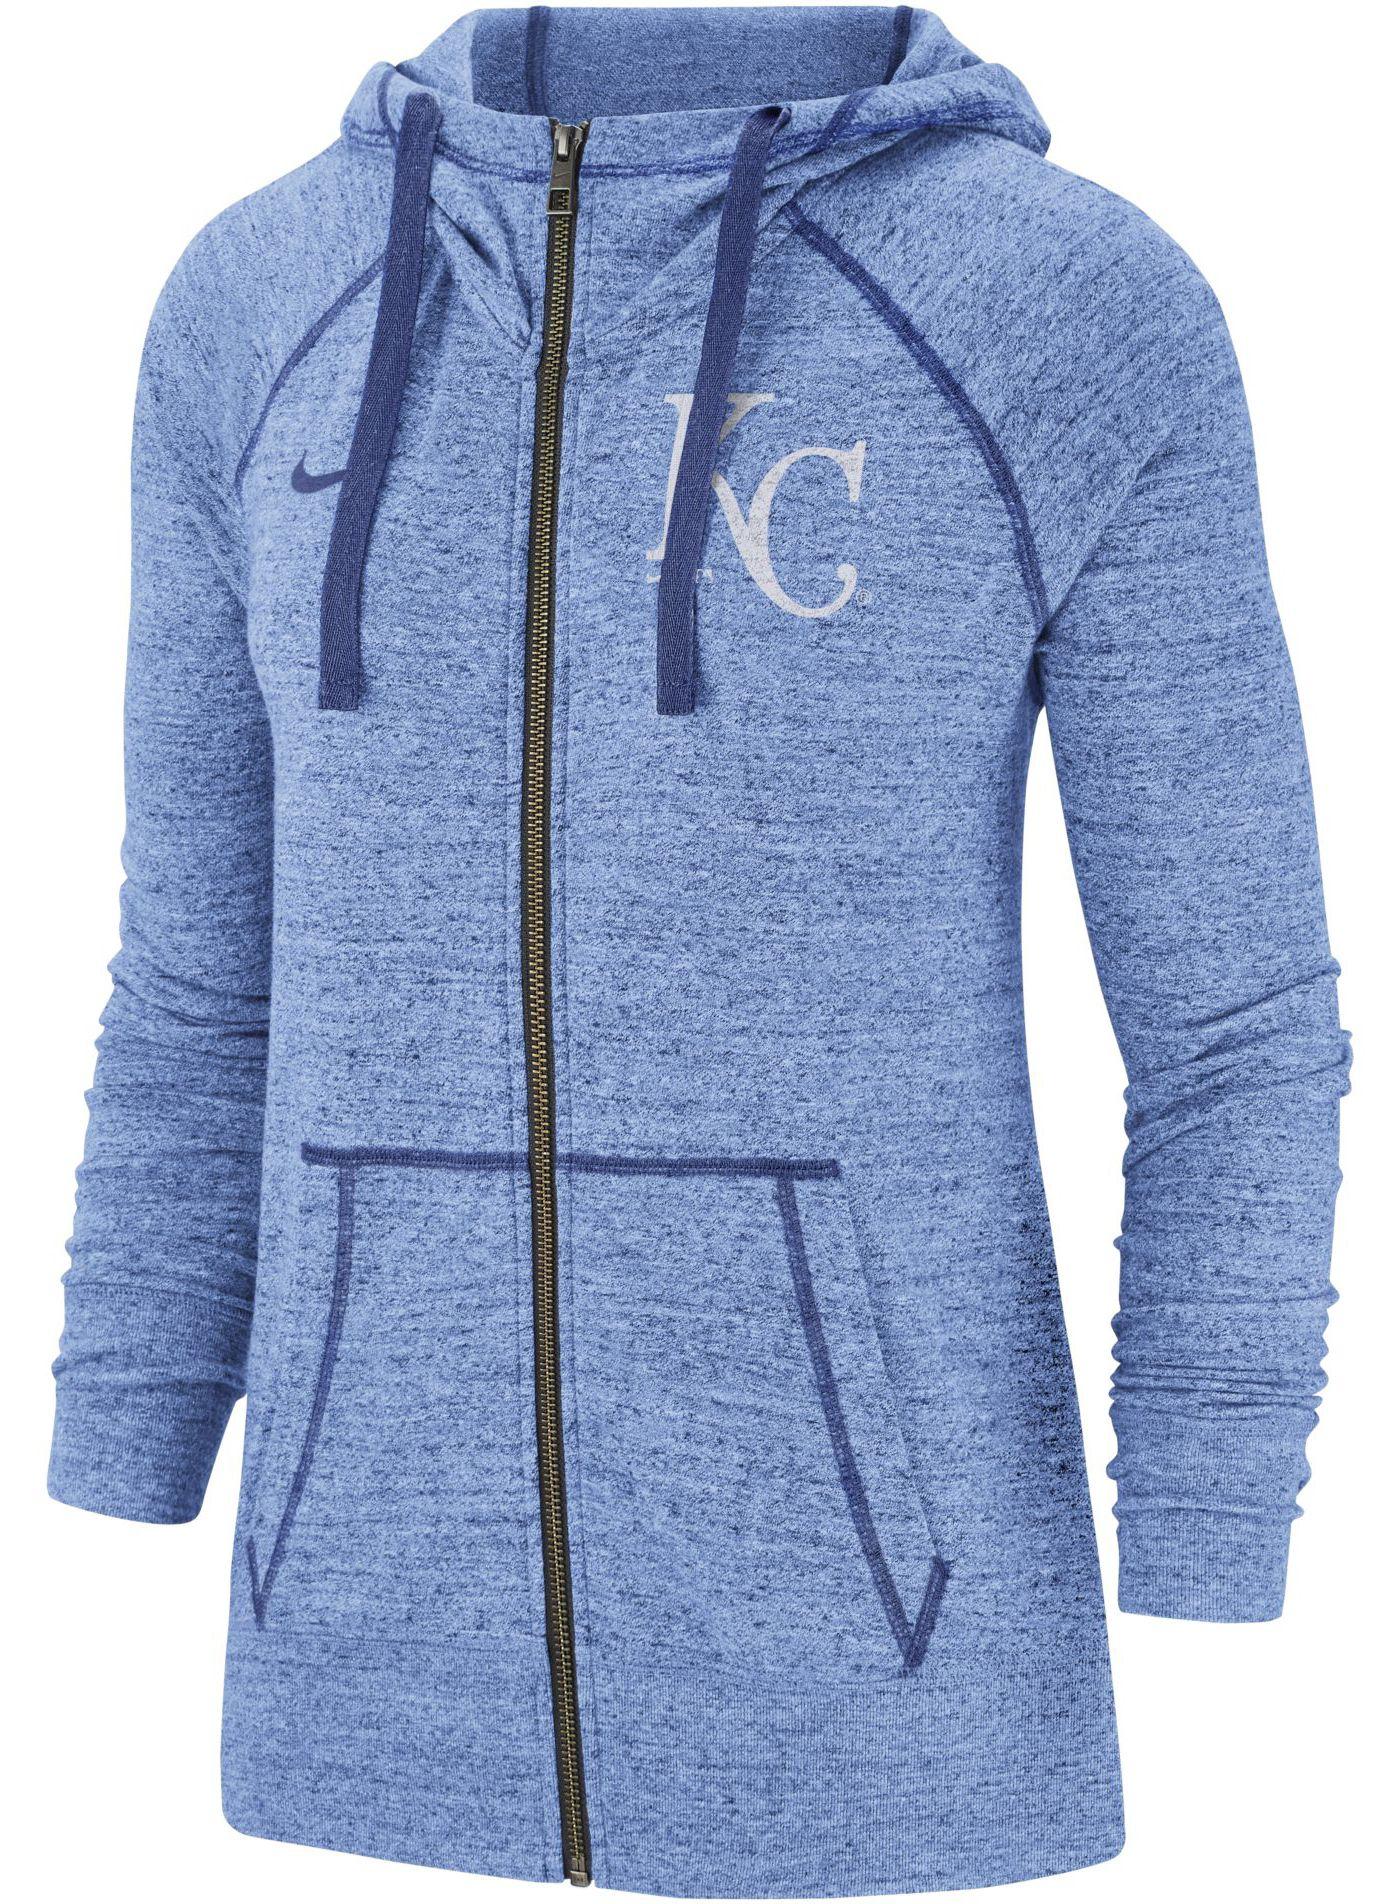 Nike Women's Kansas City Royals Vintage Full-Zip Hoodie